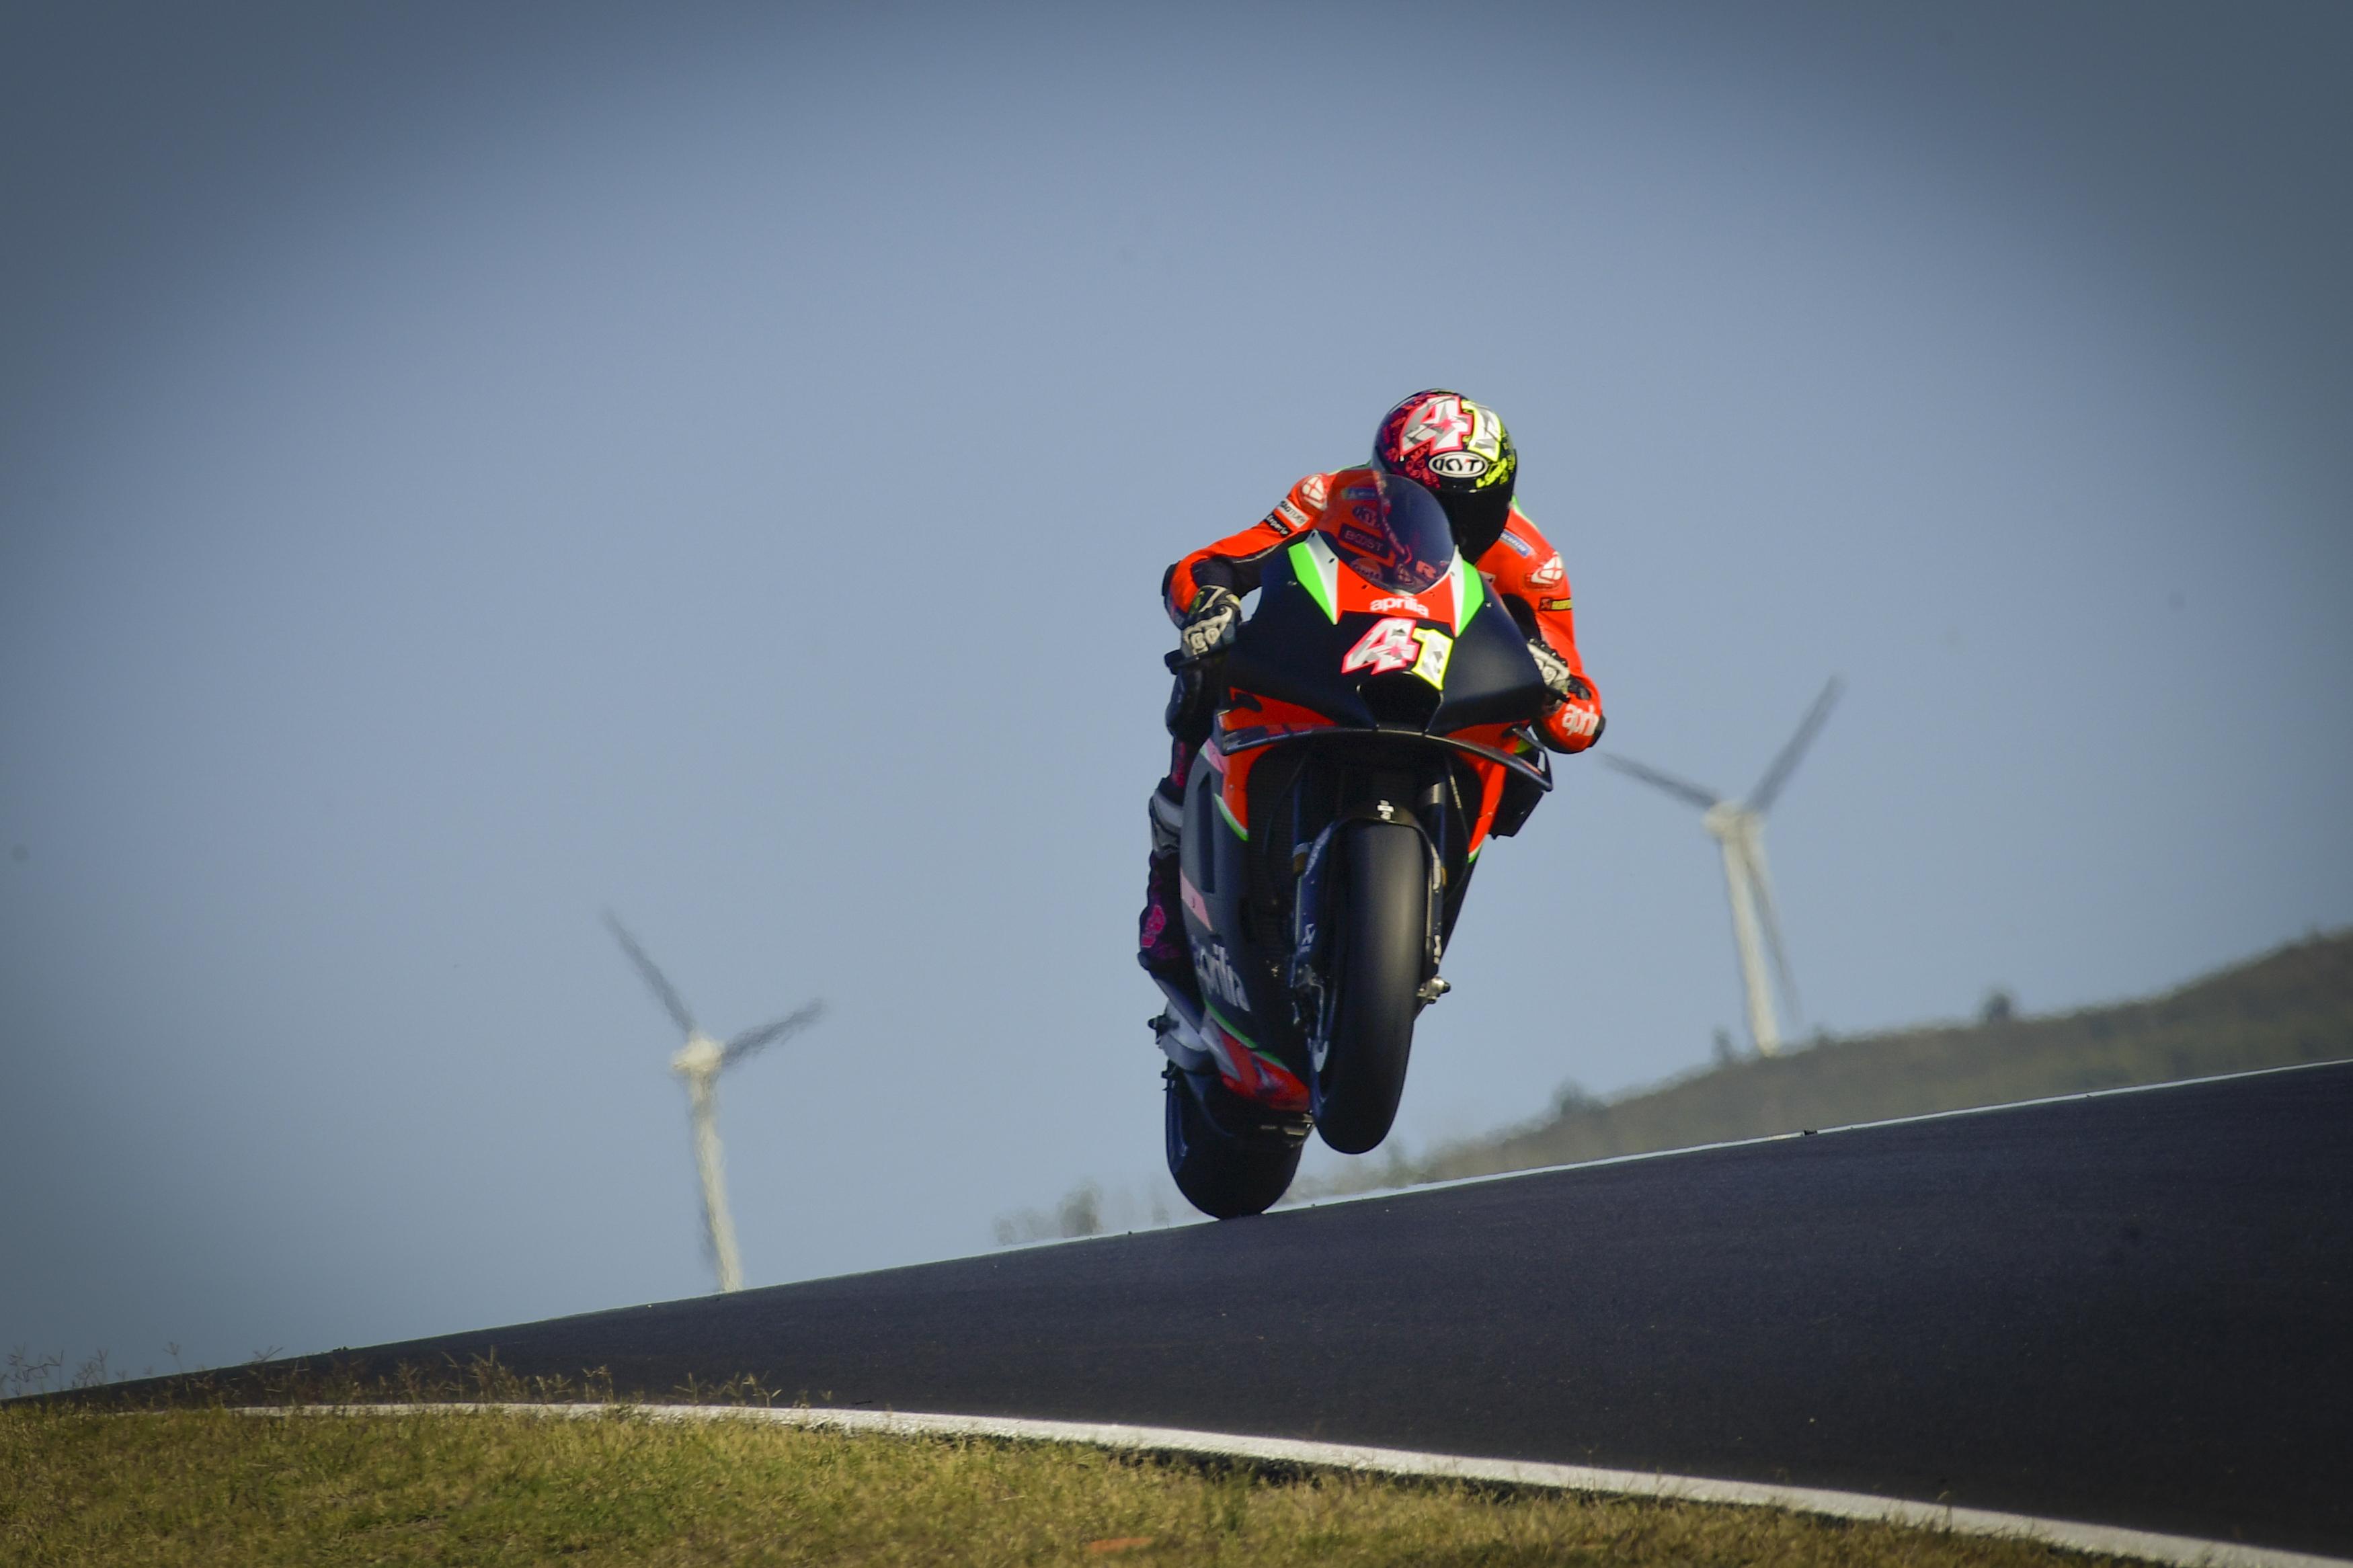 Aleix Espargaro Aprilia Algarve MotoGP test 2020